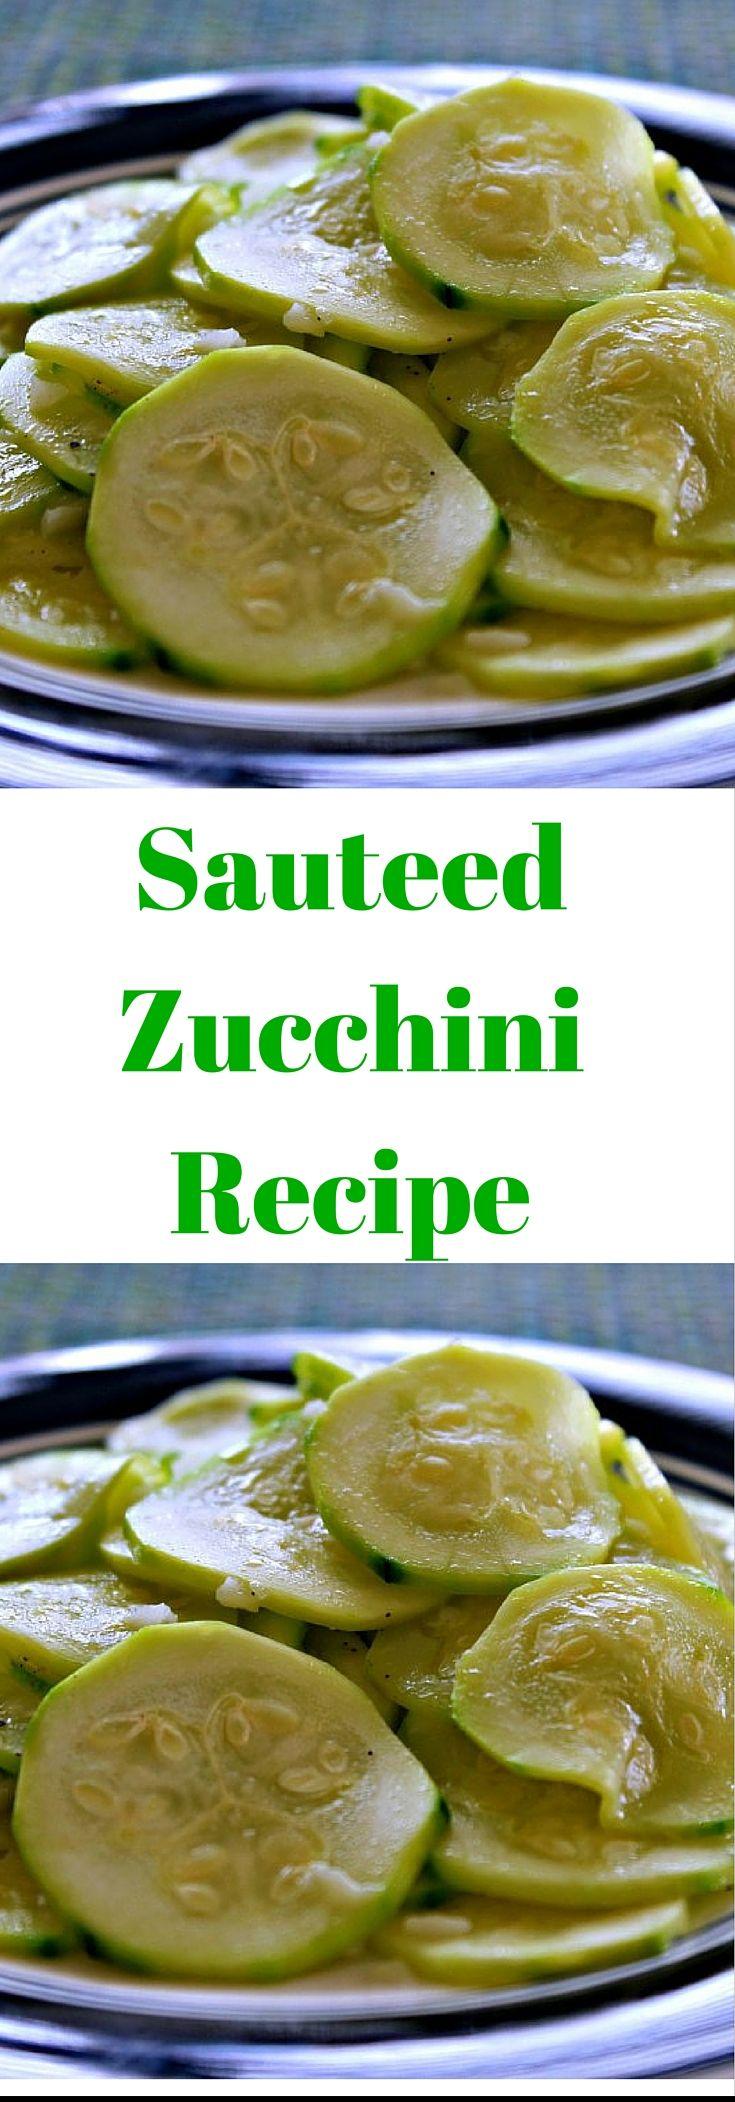 100+ Sauteed zucchini recipes on Pinterest   Sauteed ...